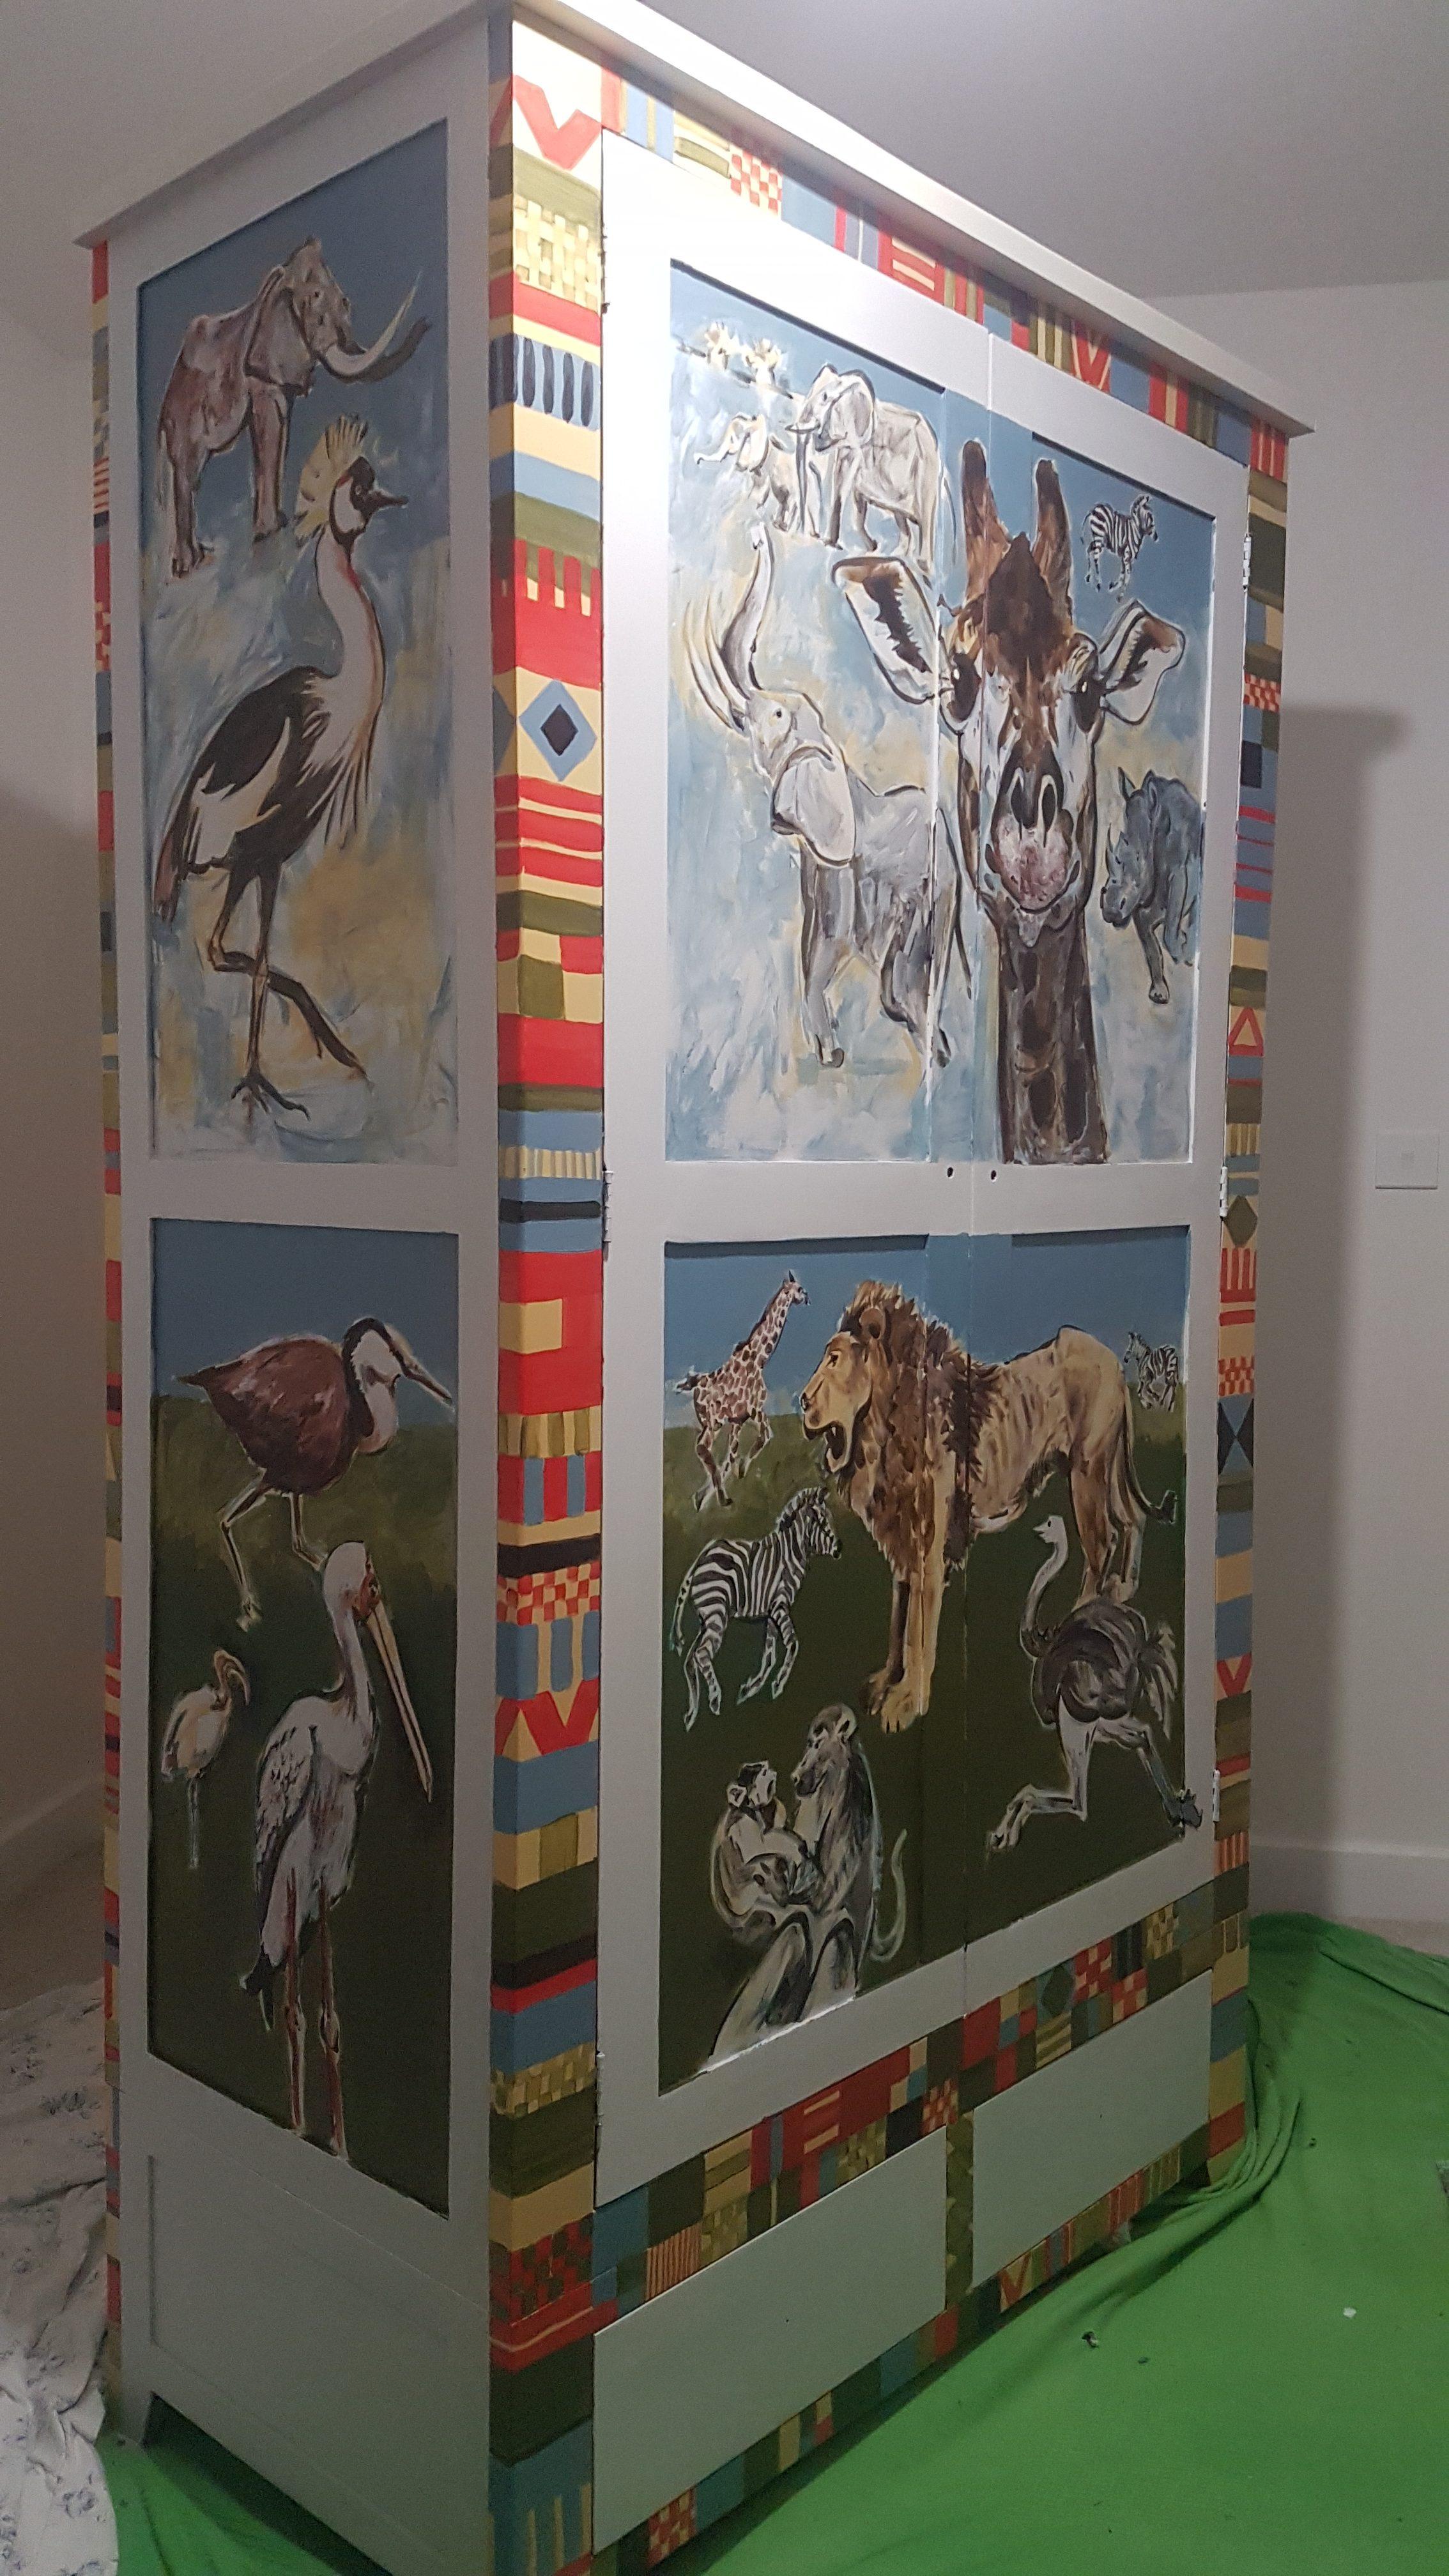 On safari, in the nursery wardrobe!